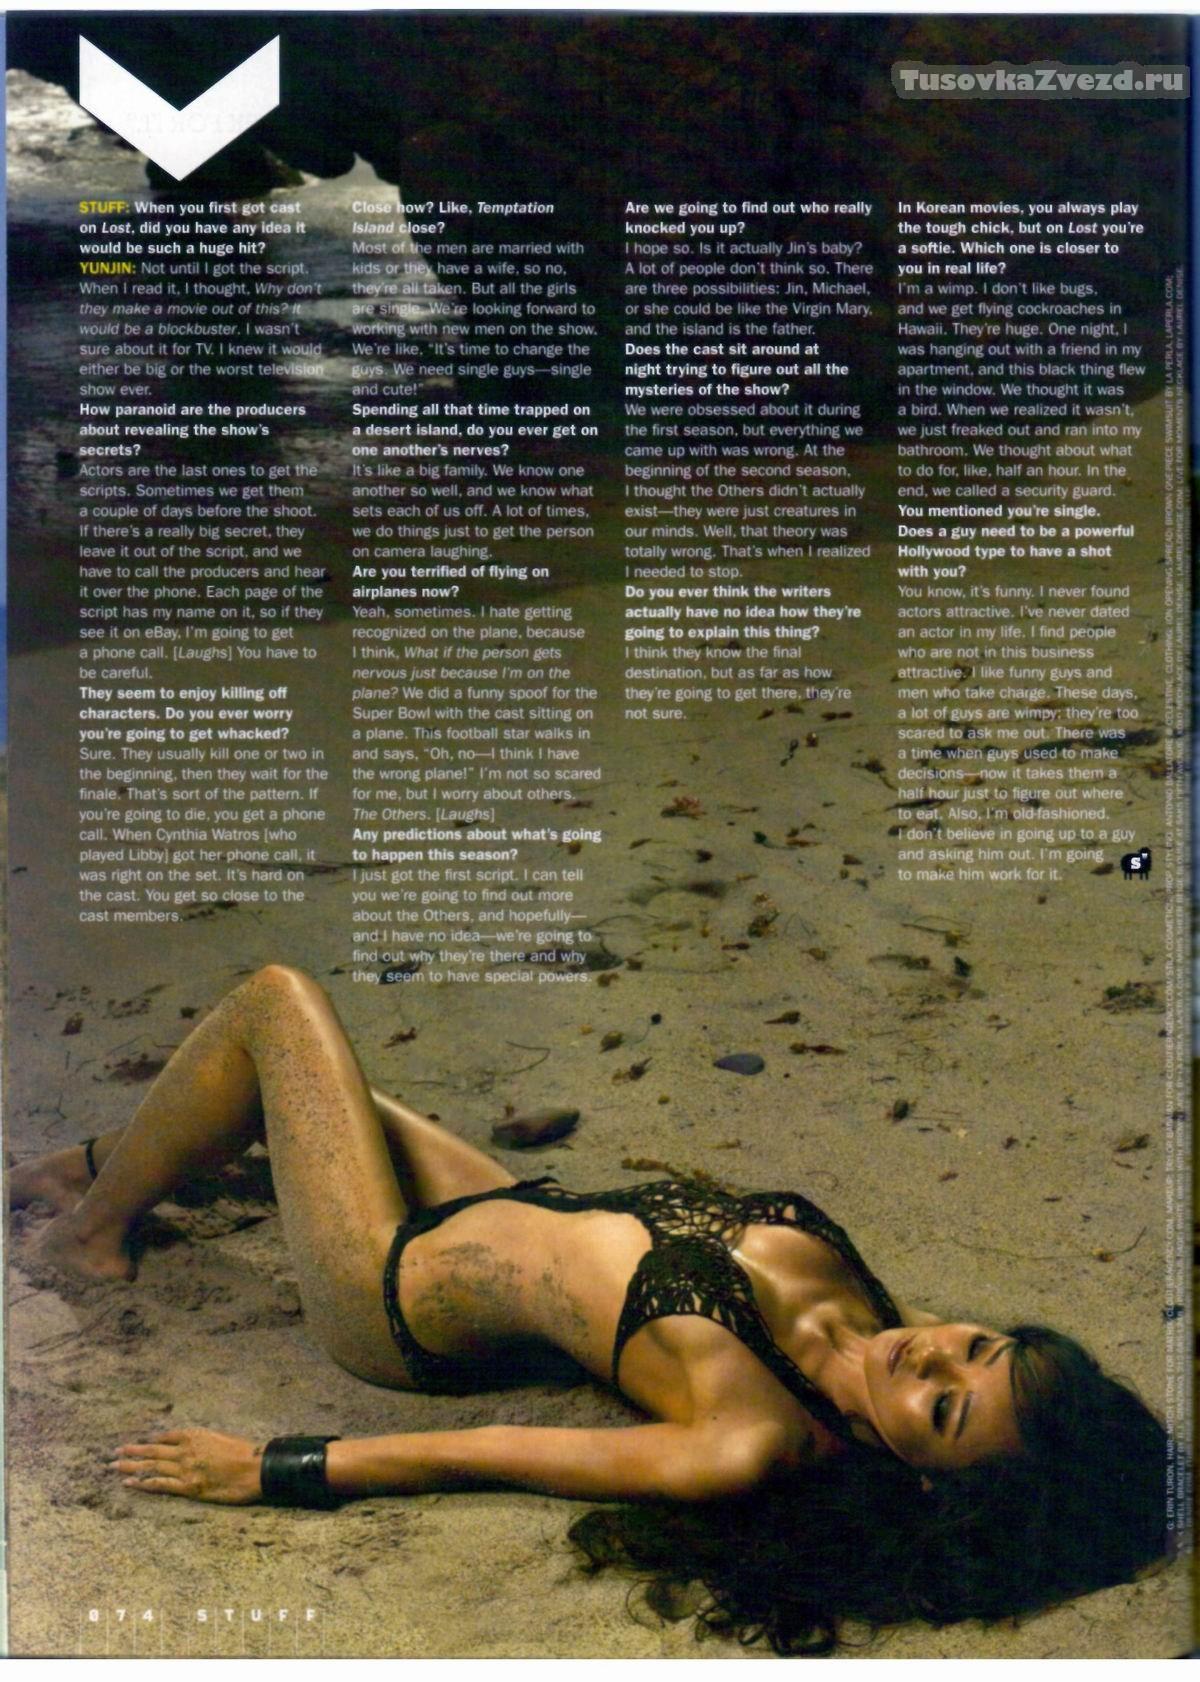 Юн-жин Ким (Yunjin Kim) эротическая фото сессия для журнала Stuff США, октябрь 2006